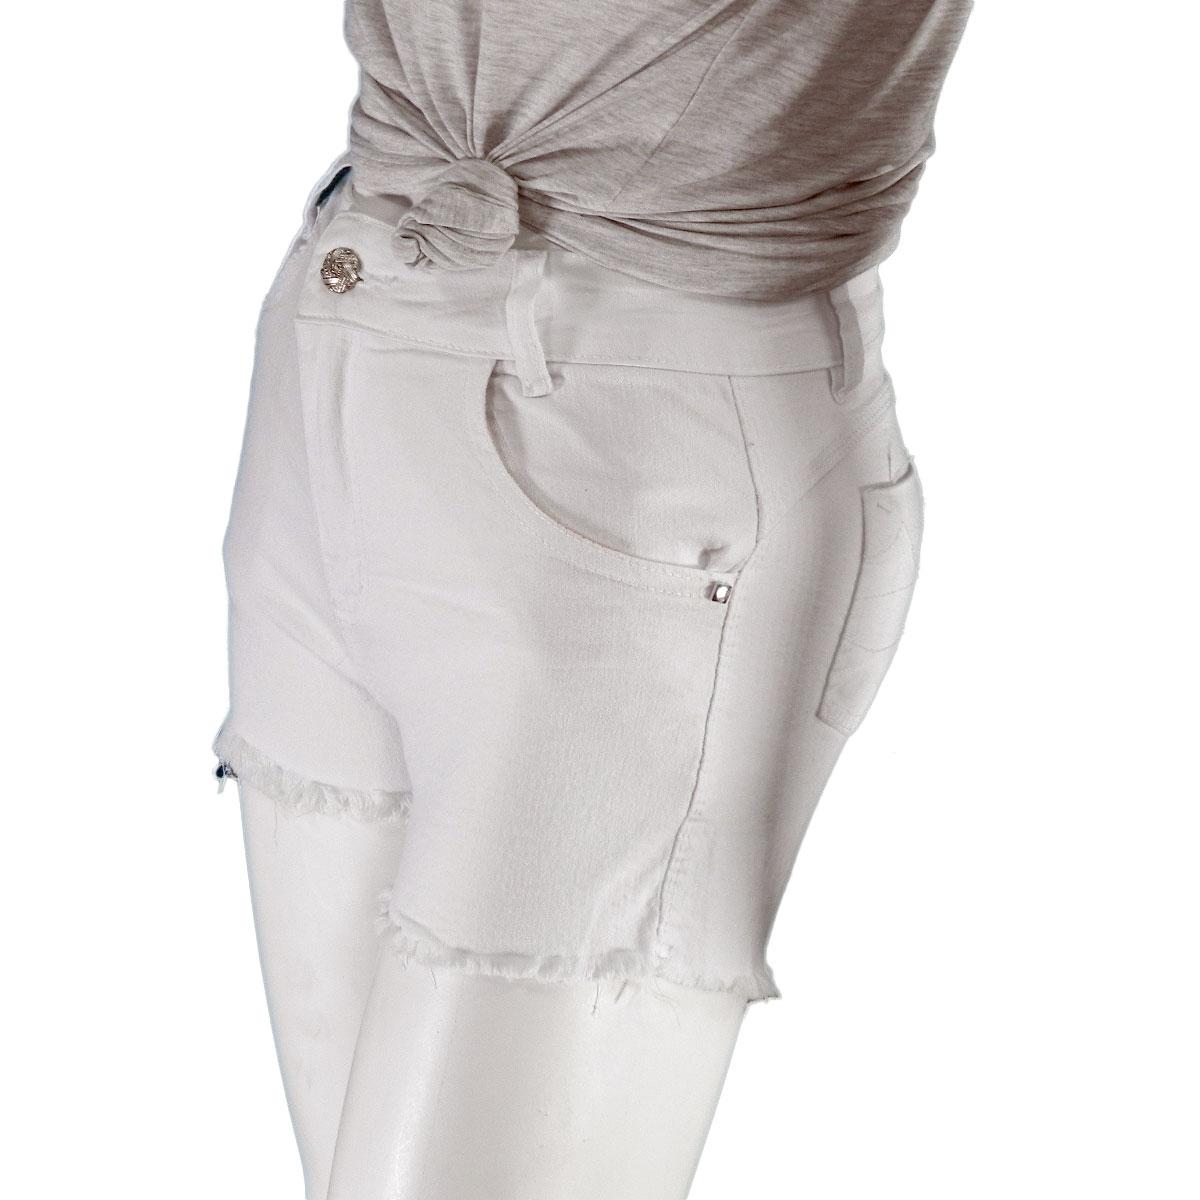 Shorts Feminino  Jeans Branco Desfiado